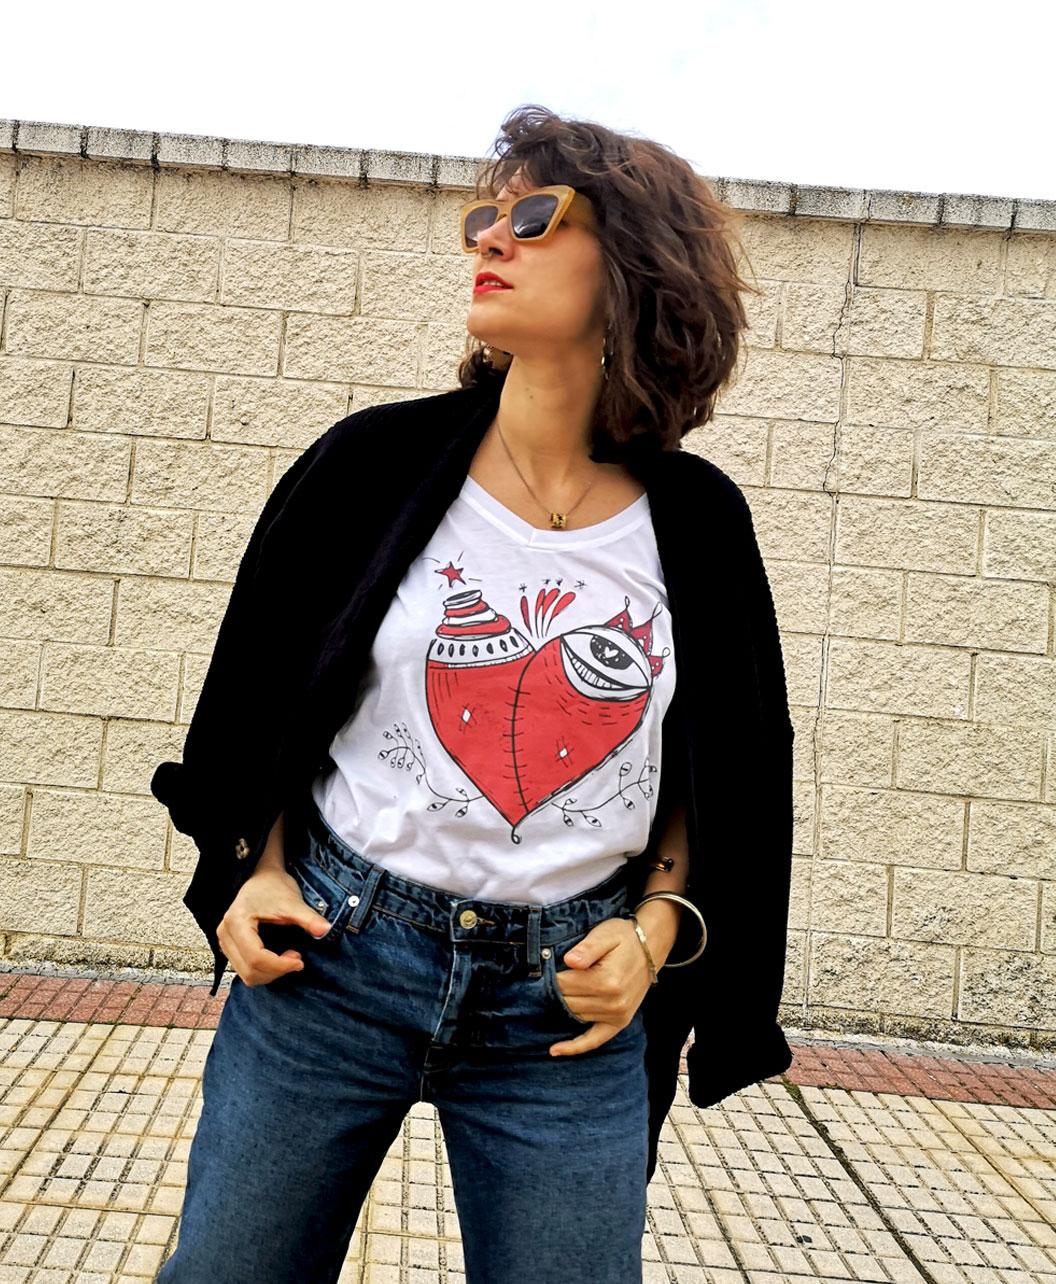 camiseta mujer algodon organico manga corta escote pico ilustraciones diferentes corazon malherido